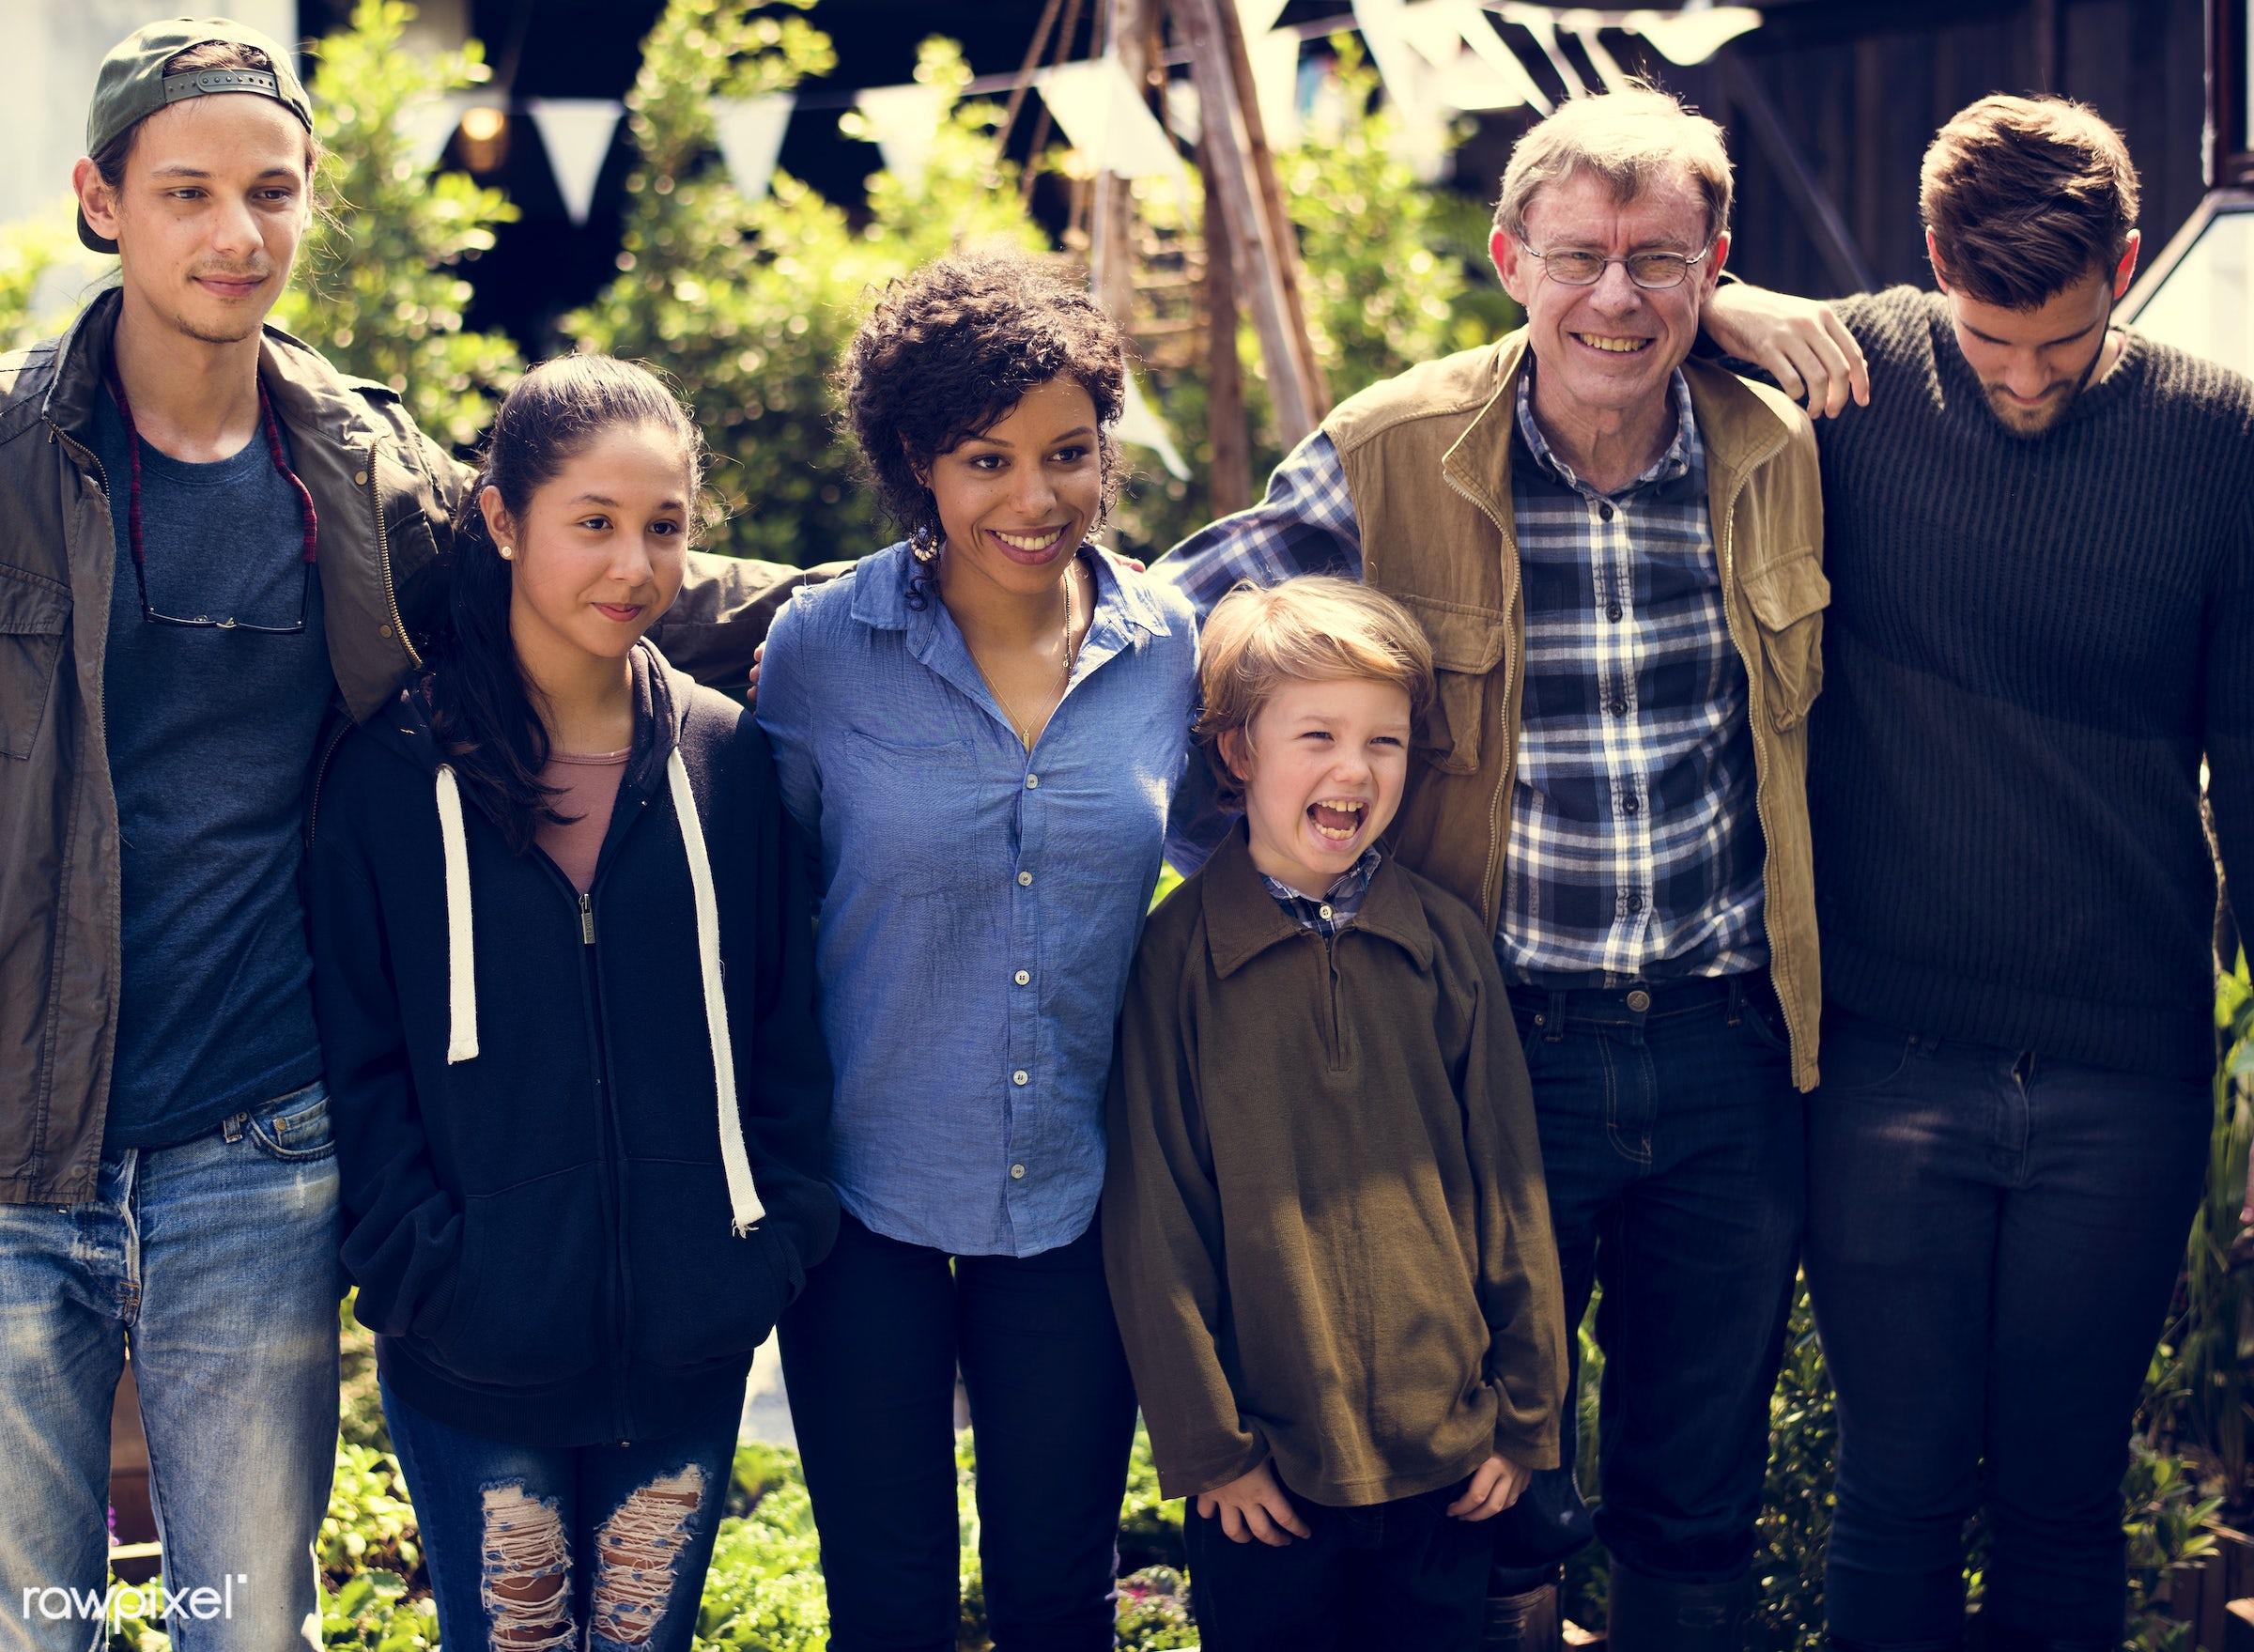 person, little, people, together, crop, kid, teamwork, retirement, friends, farmer, nature, woman, friendship, cheerful,...